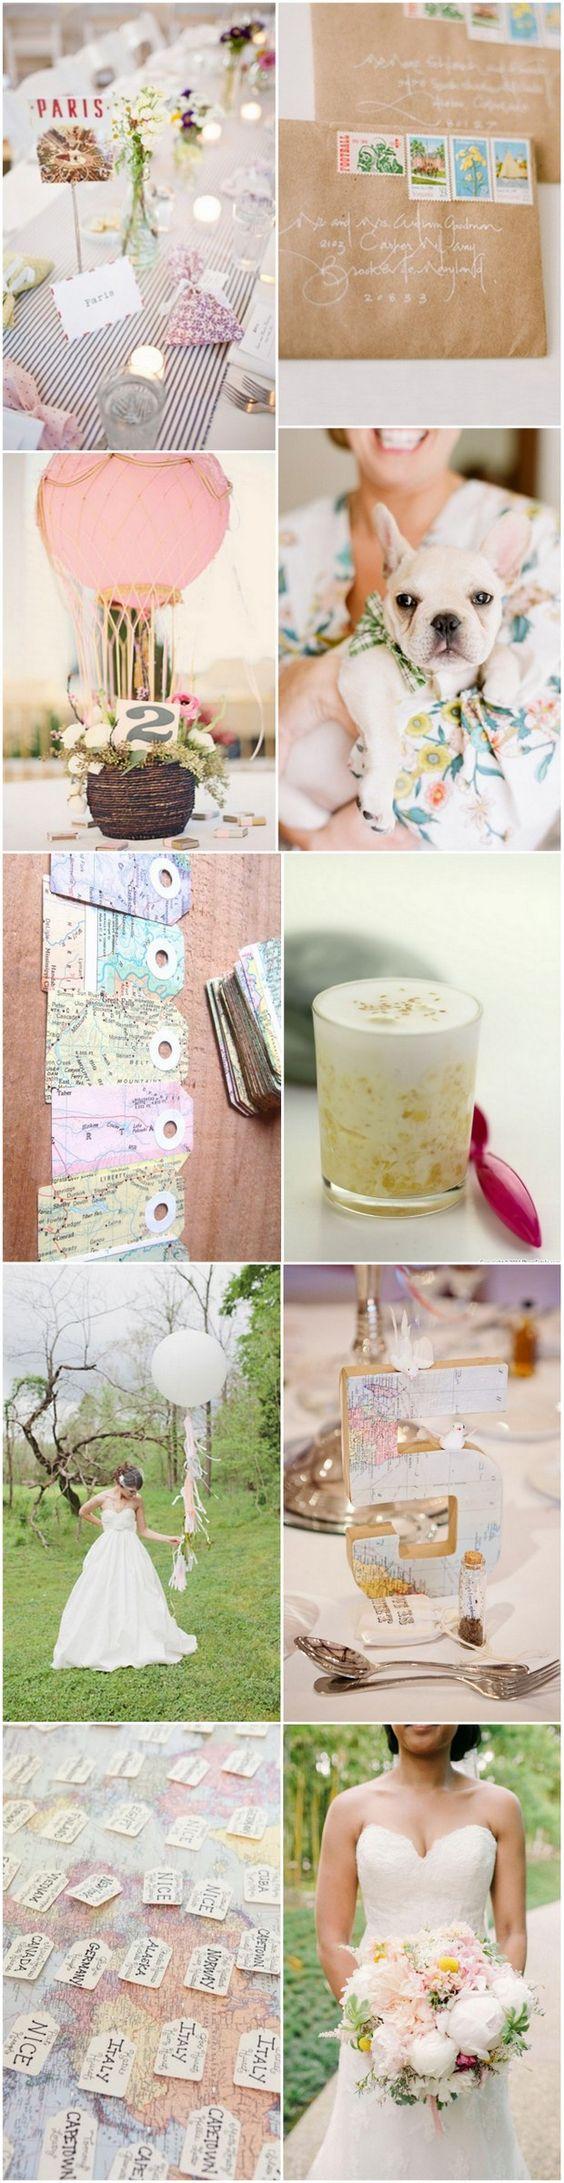 Dreamy Destination & Travel Themed Wedding Inspiration | weddingsonline